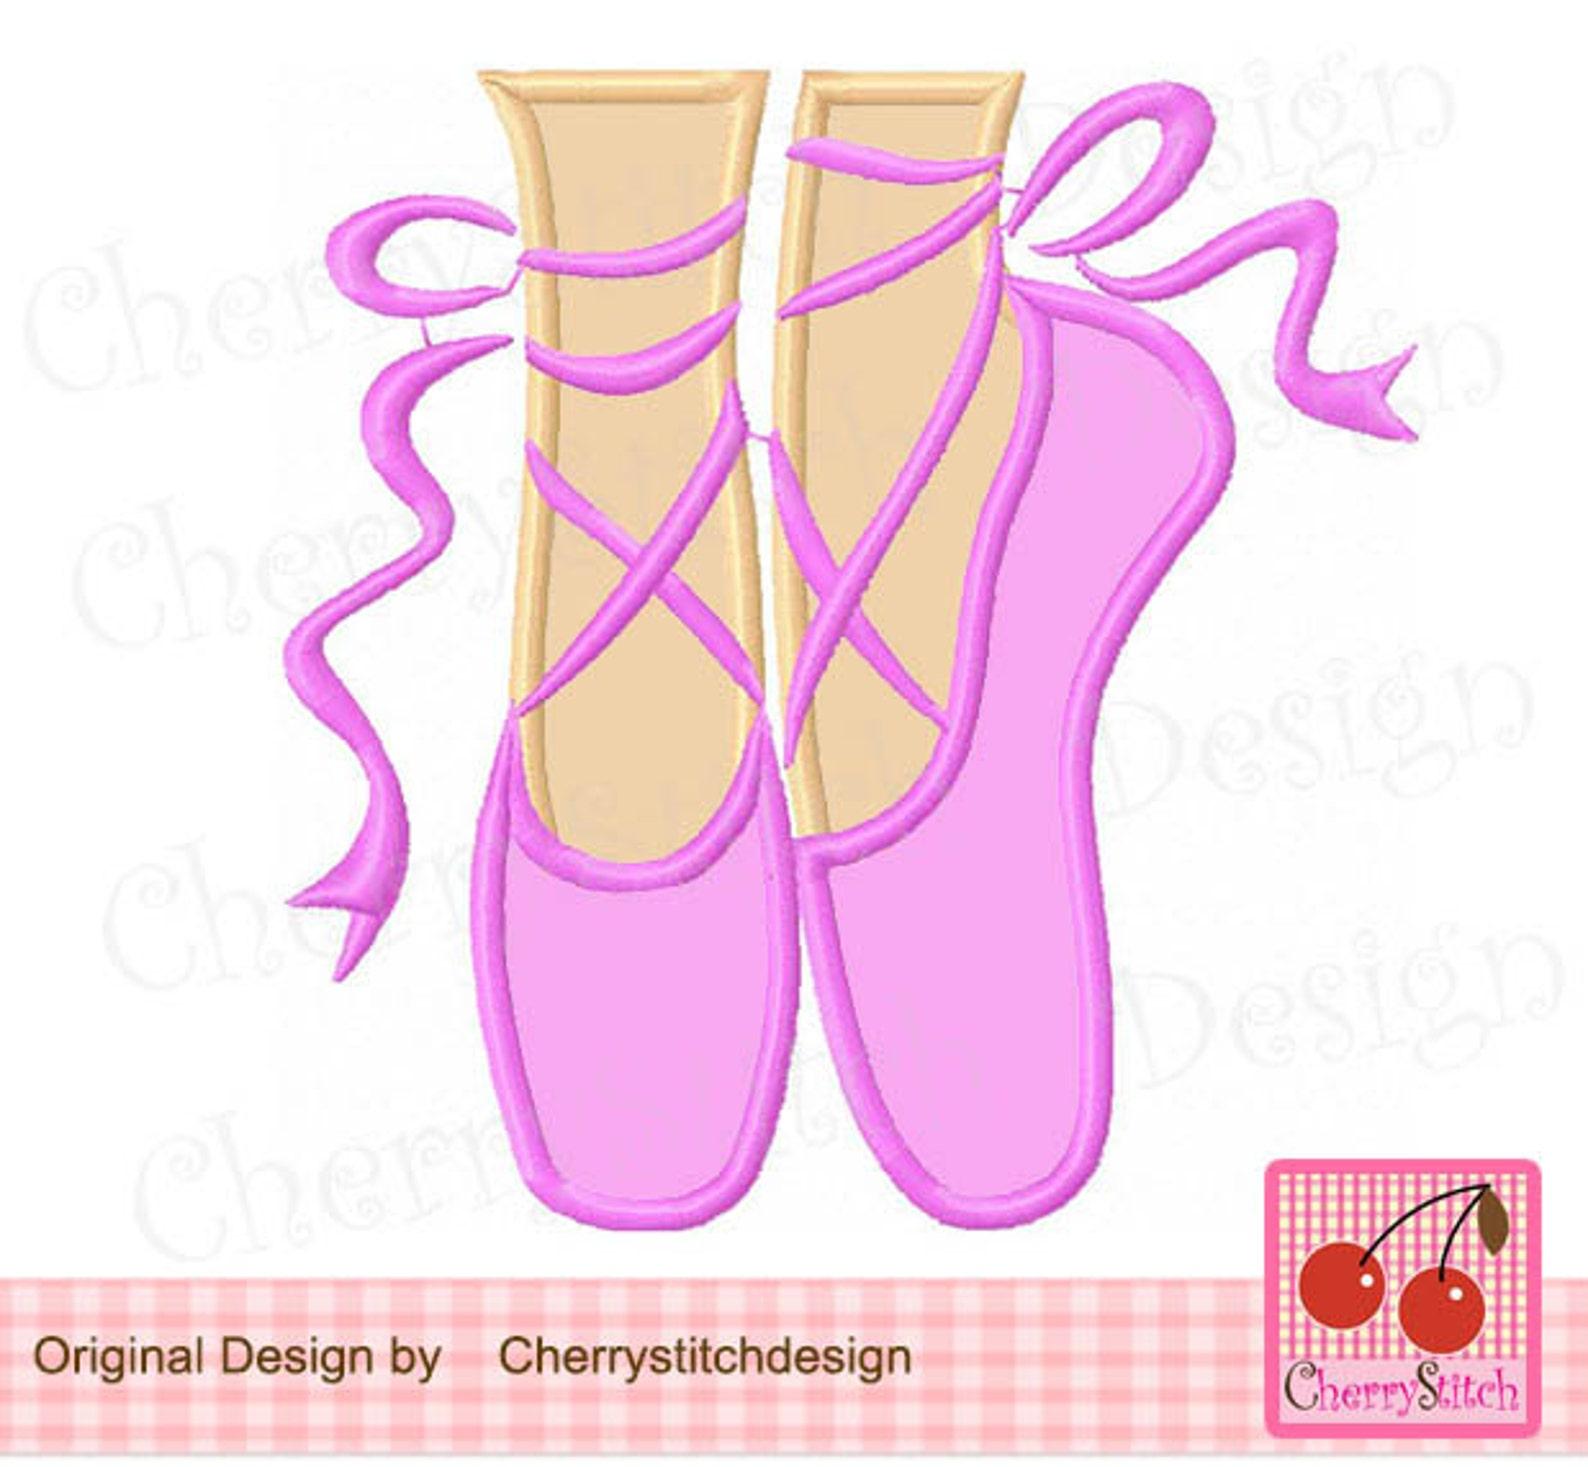 ballet shoes ballerina machine embroidery design bg0019 -4x4,5x5,6x6 inch